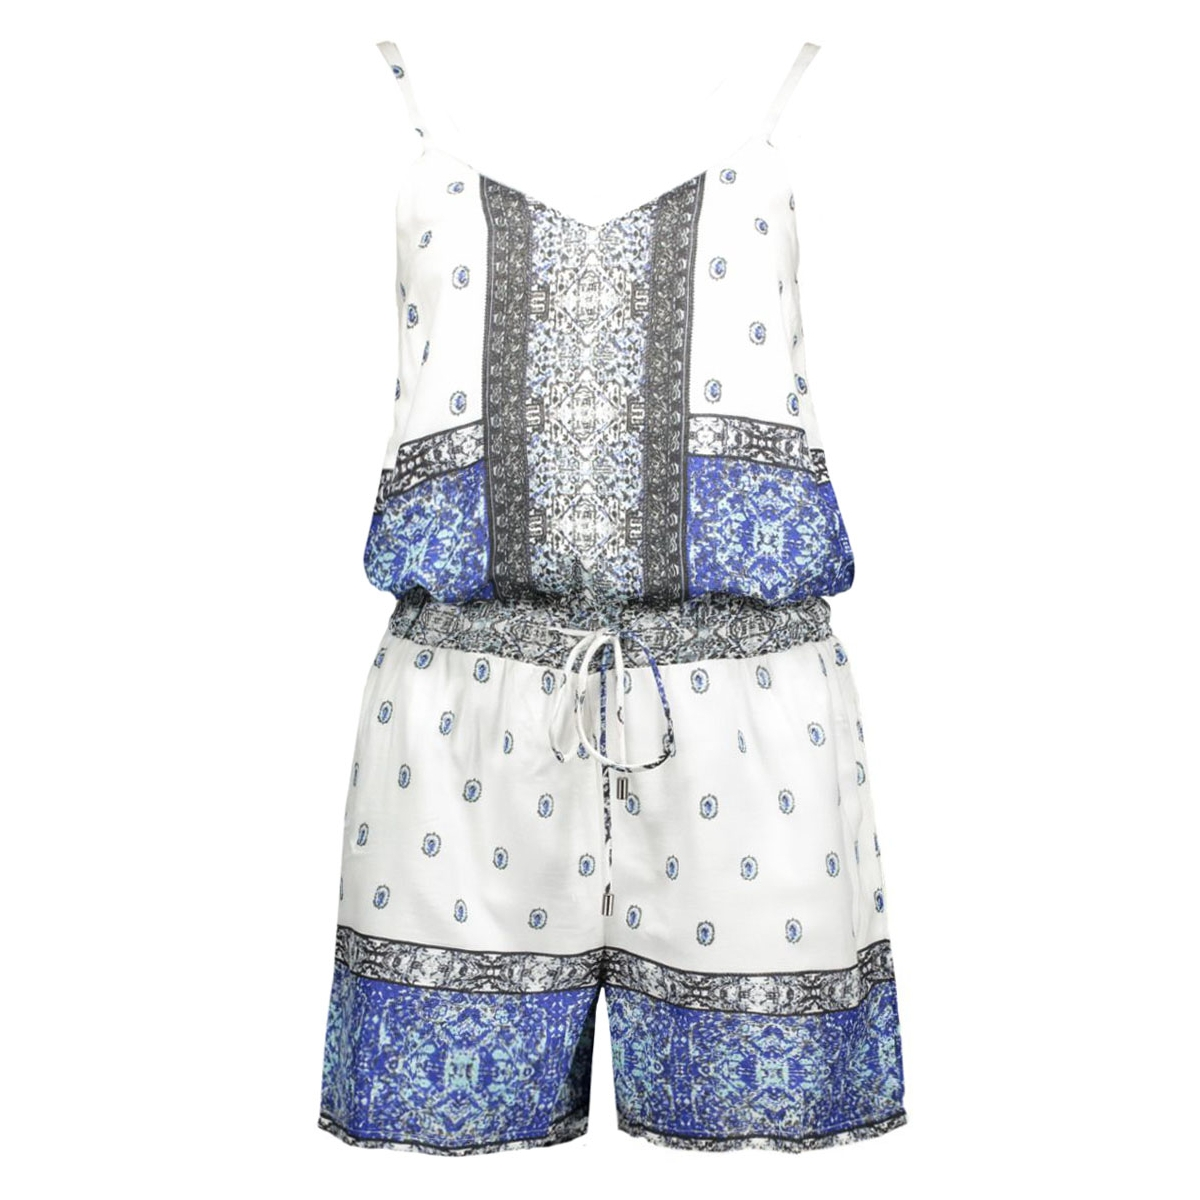 vmlupita s/l playsuit 10156590 vero moda jumpsuit black iris/lupita com